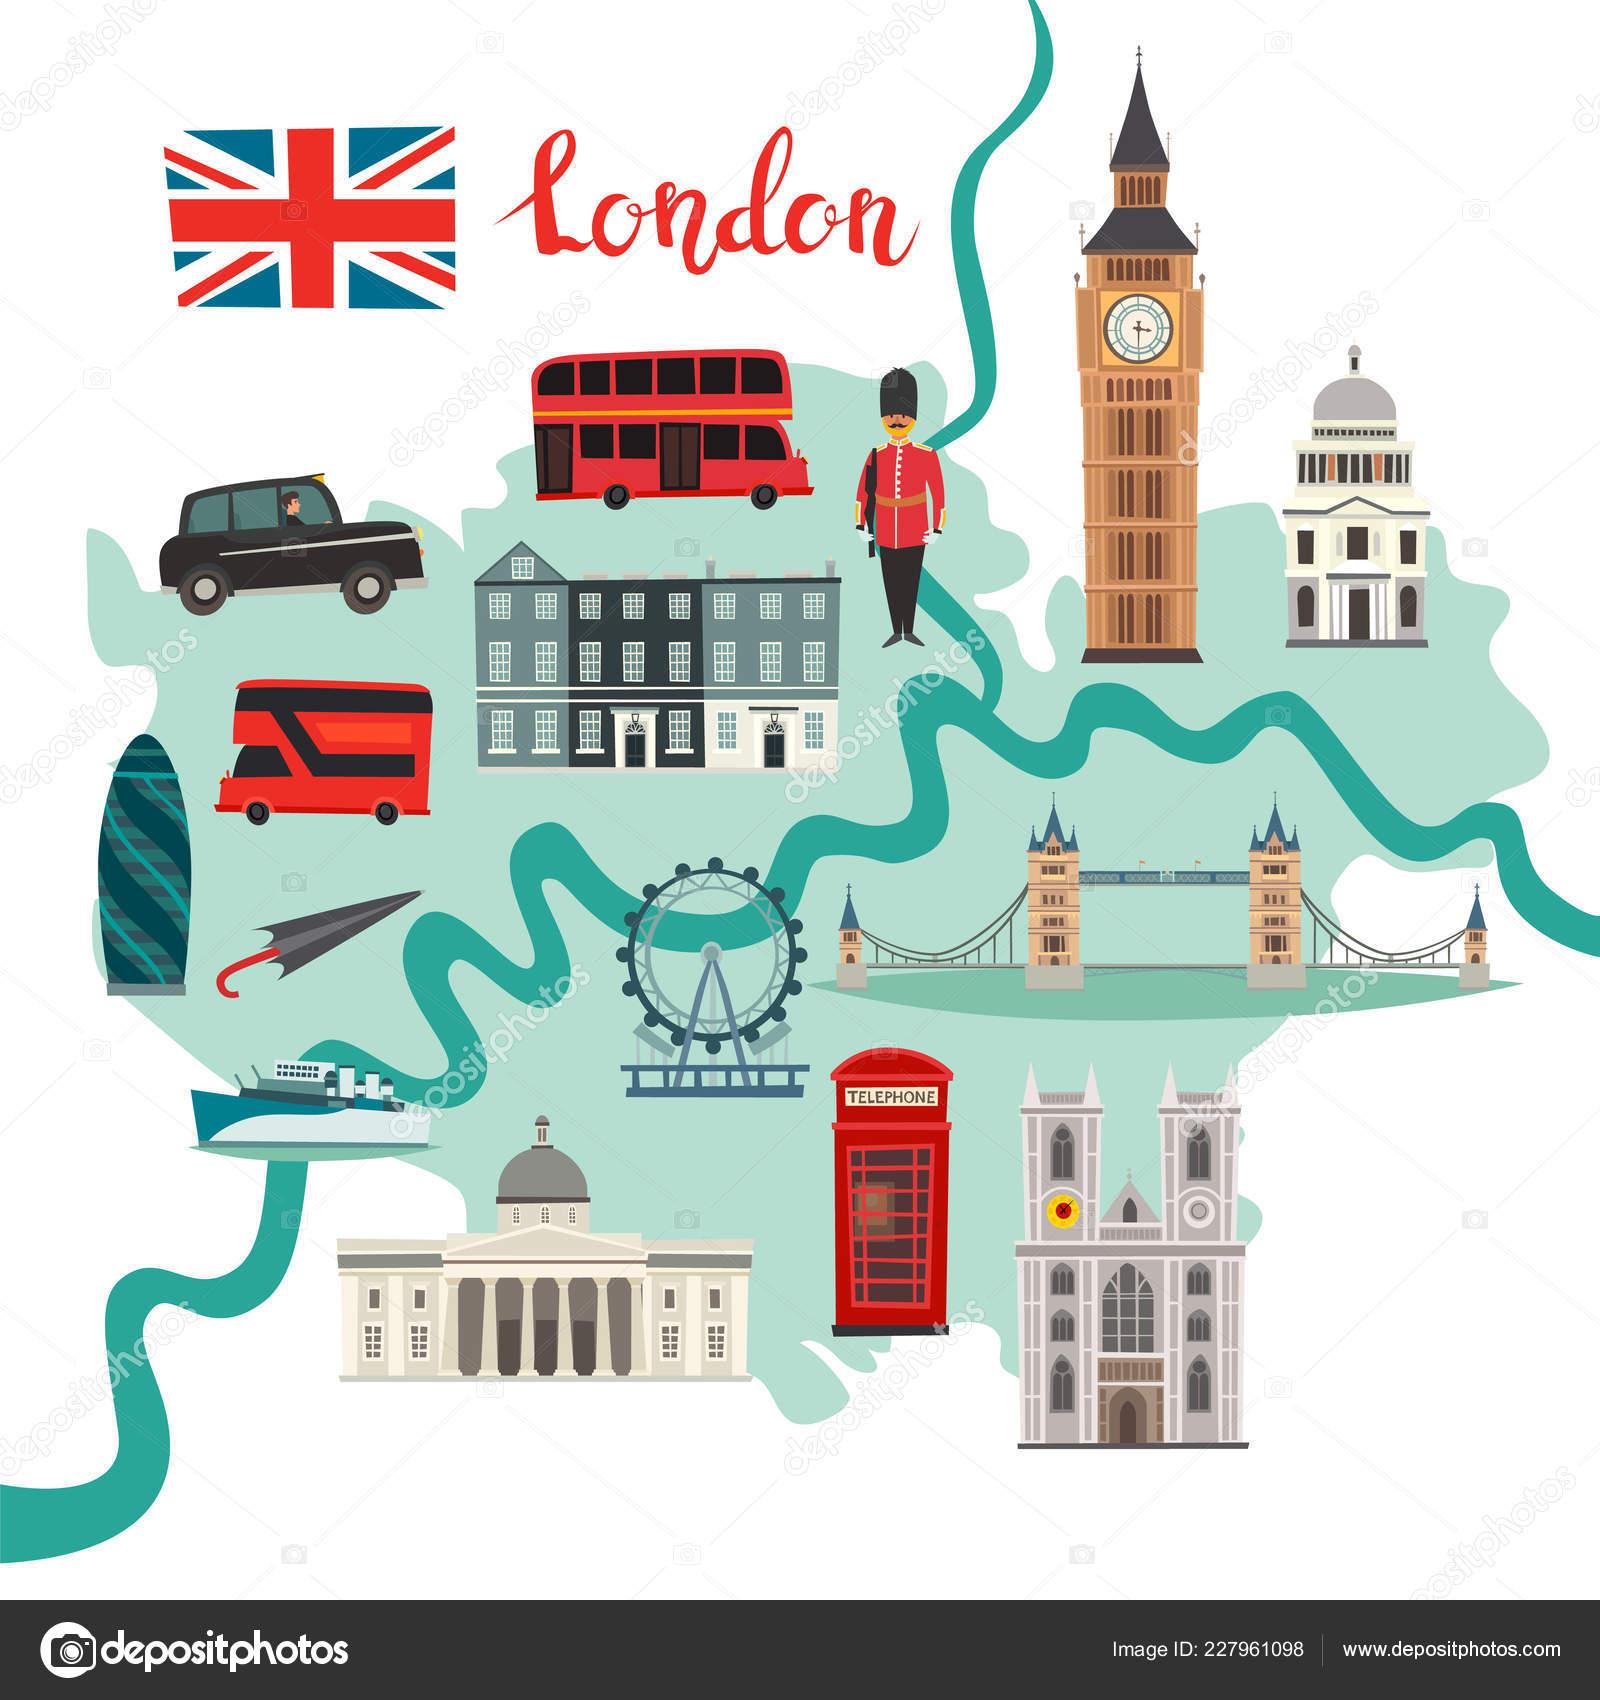 London Atlas Map.London Map Vector Abstract Atlas Poster Illustrated Map London